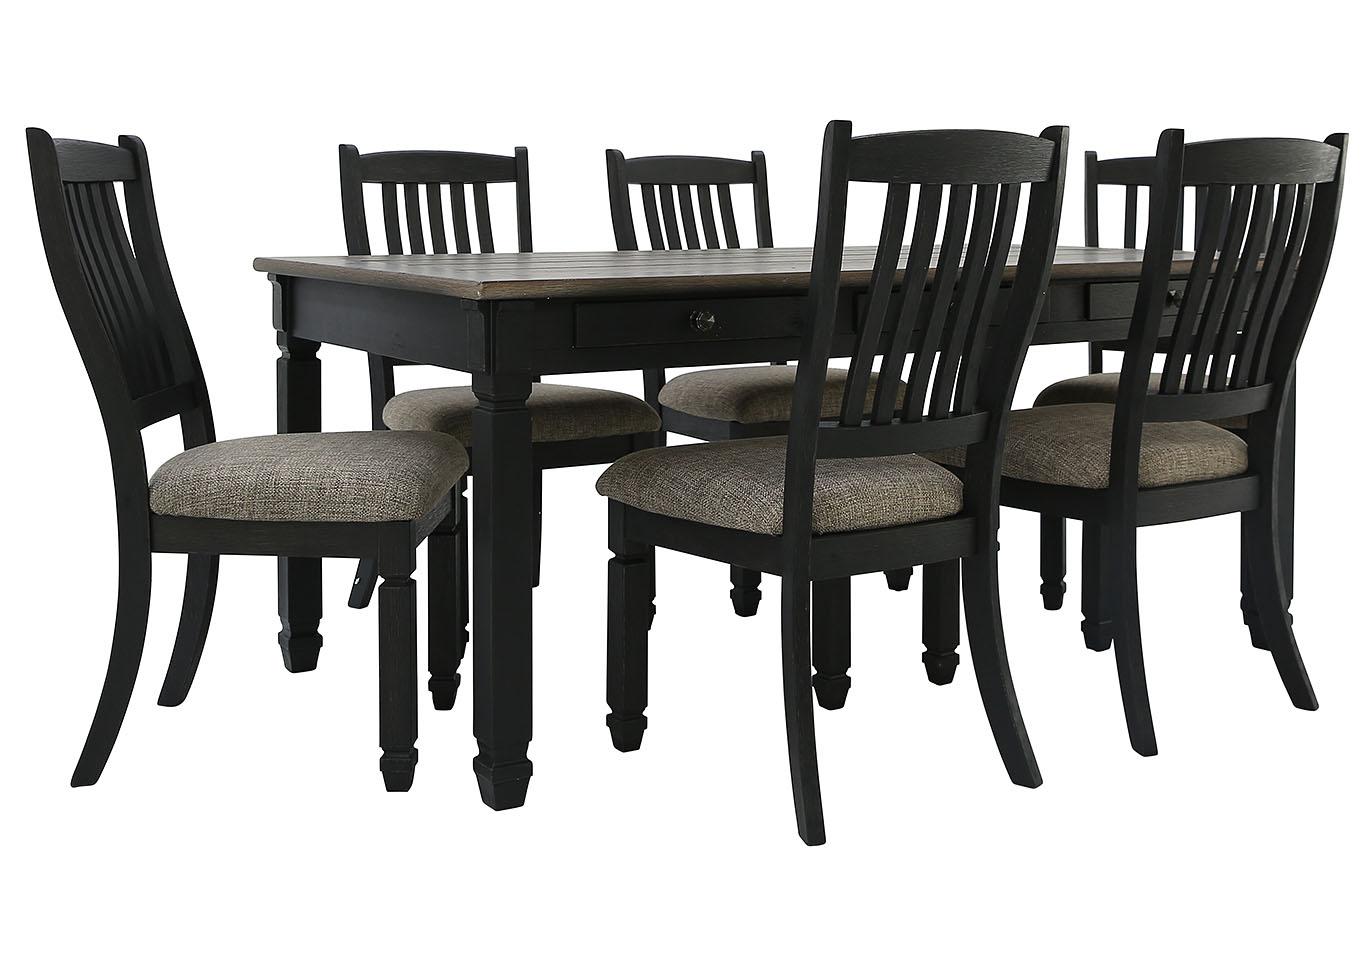 TYLER CREEK 9 PIECE DINING SET Ivan Smith Furniture